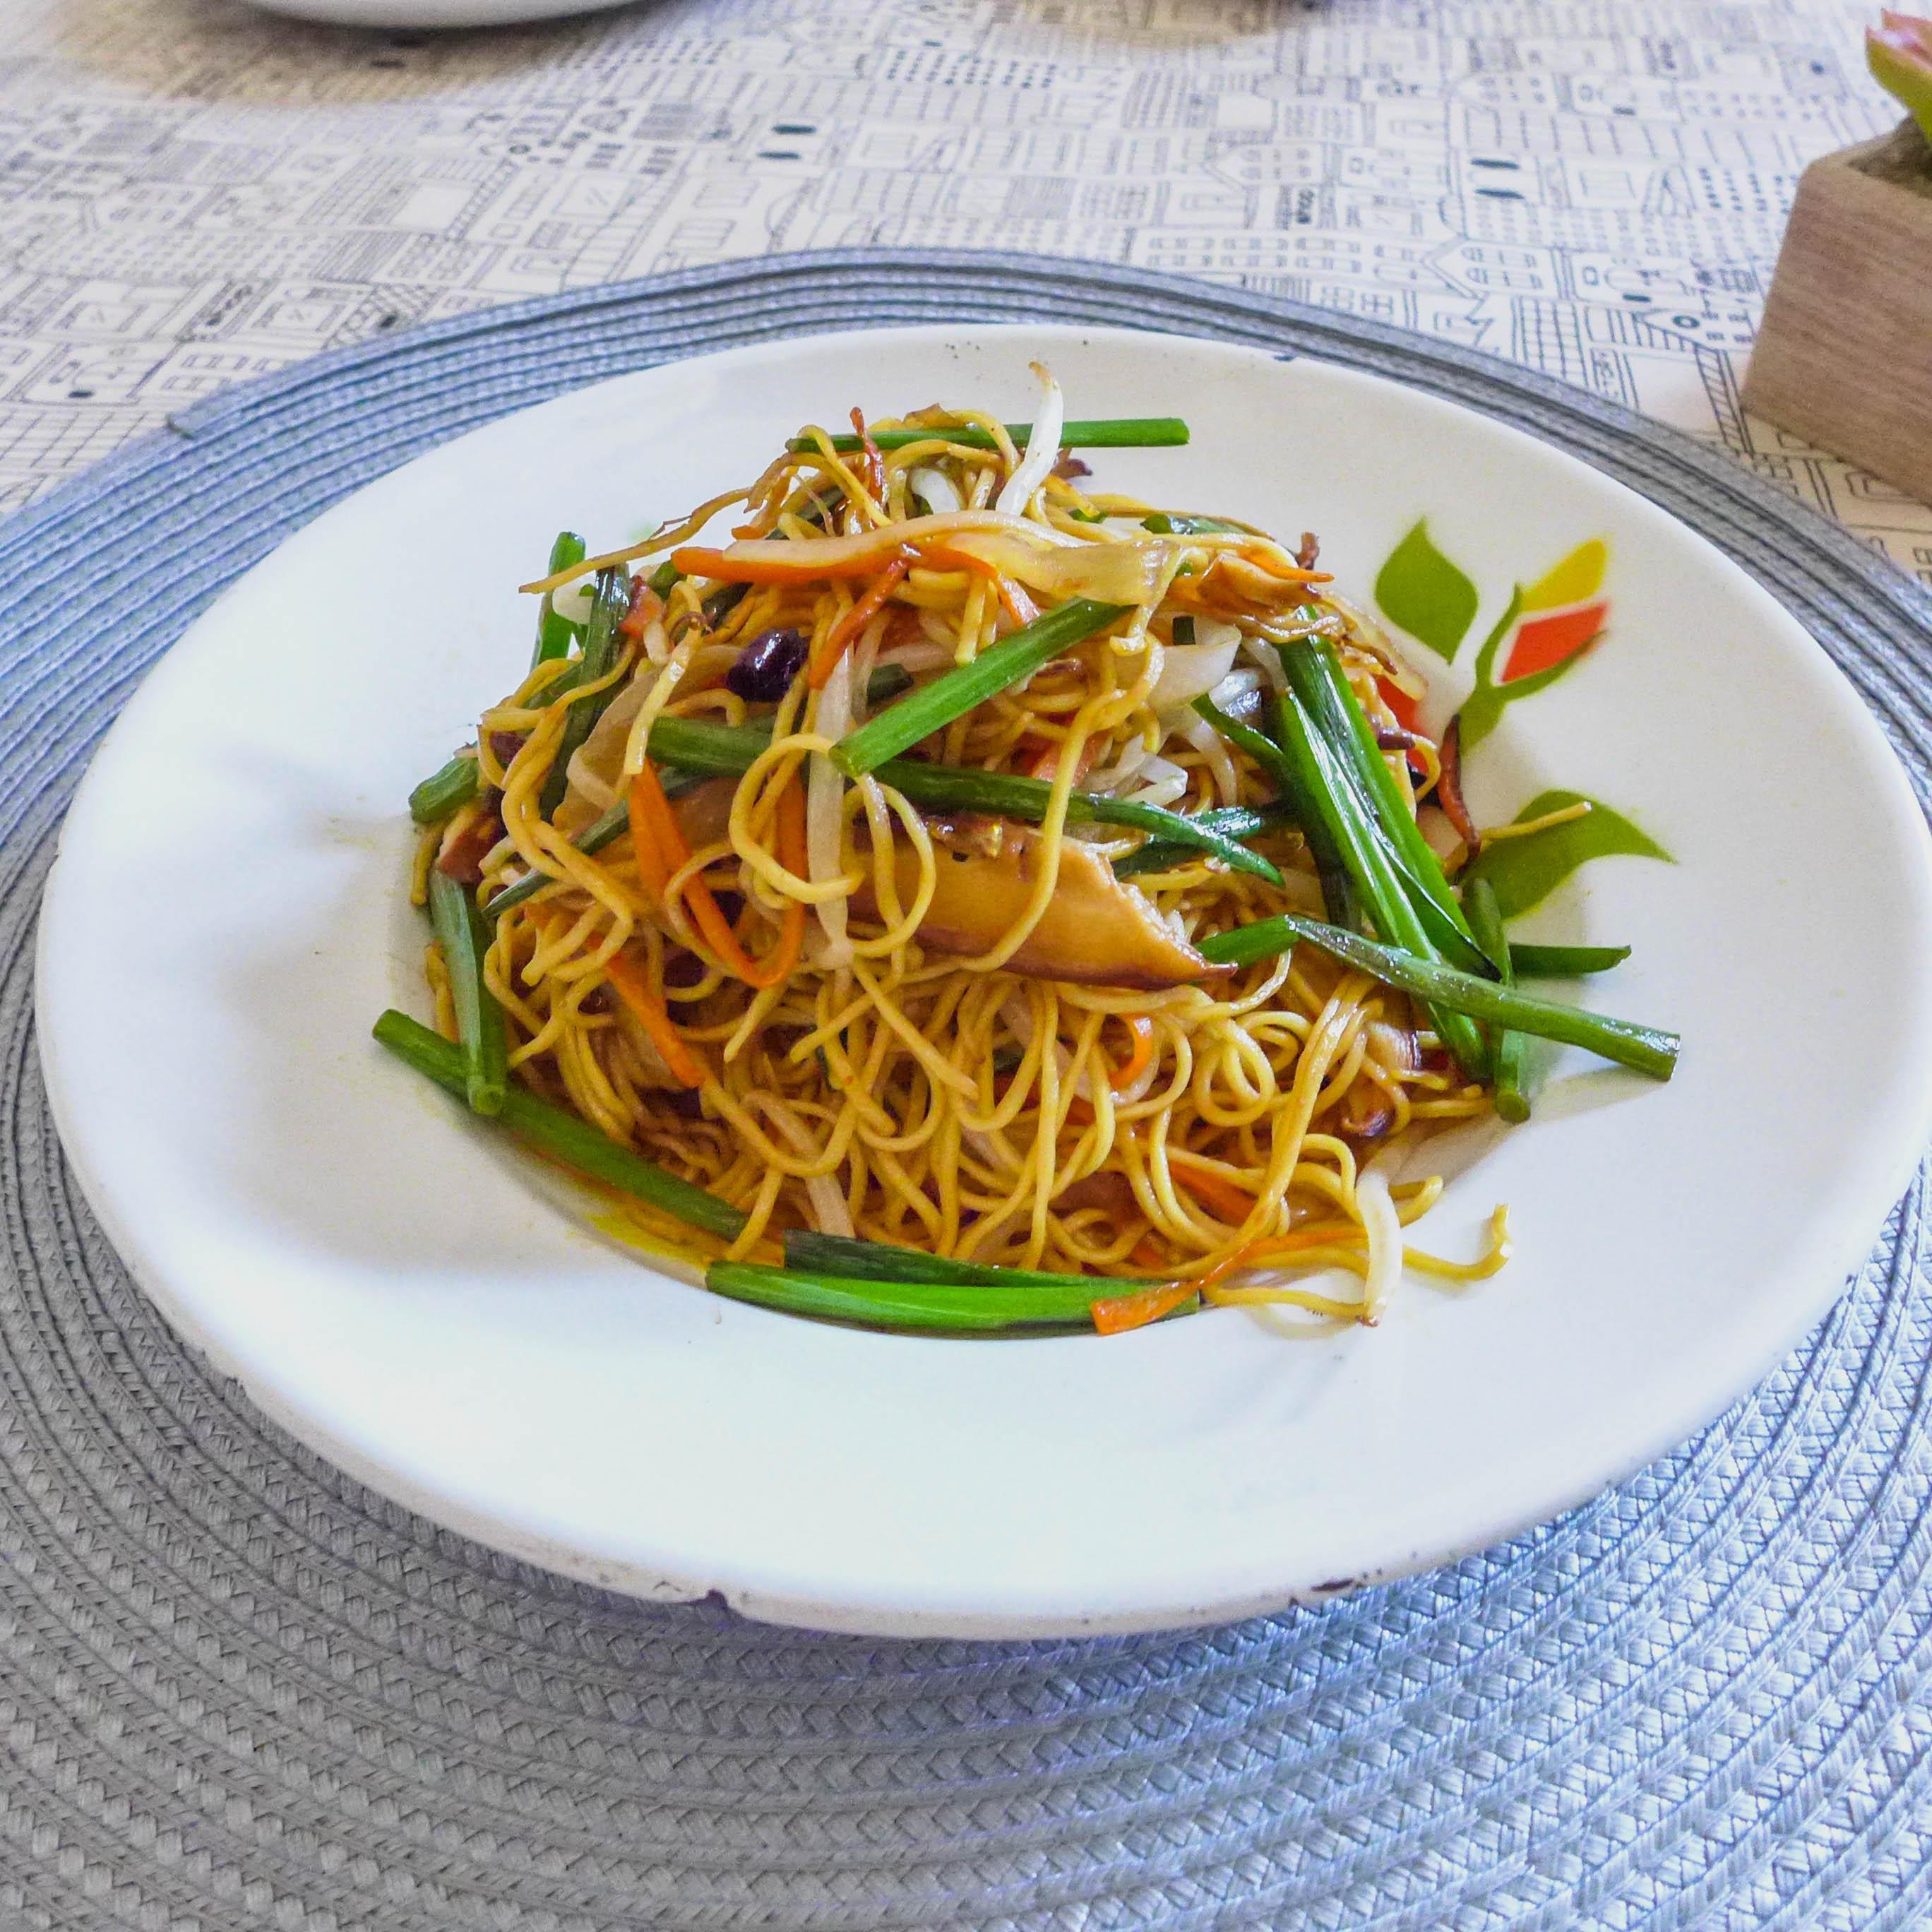 Vegetable Pan-Fried Noodles